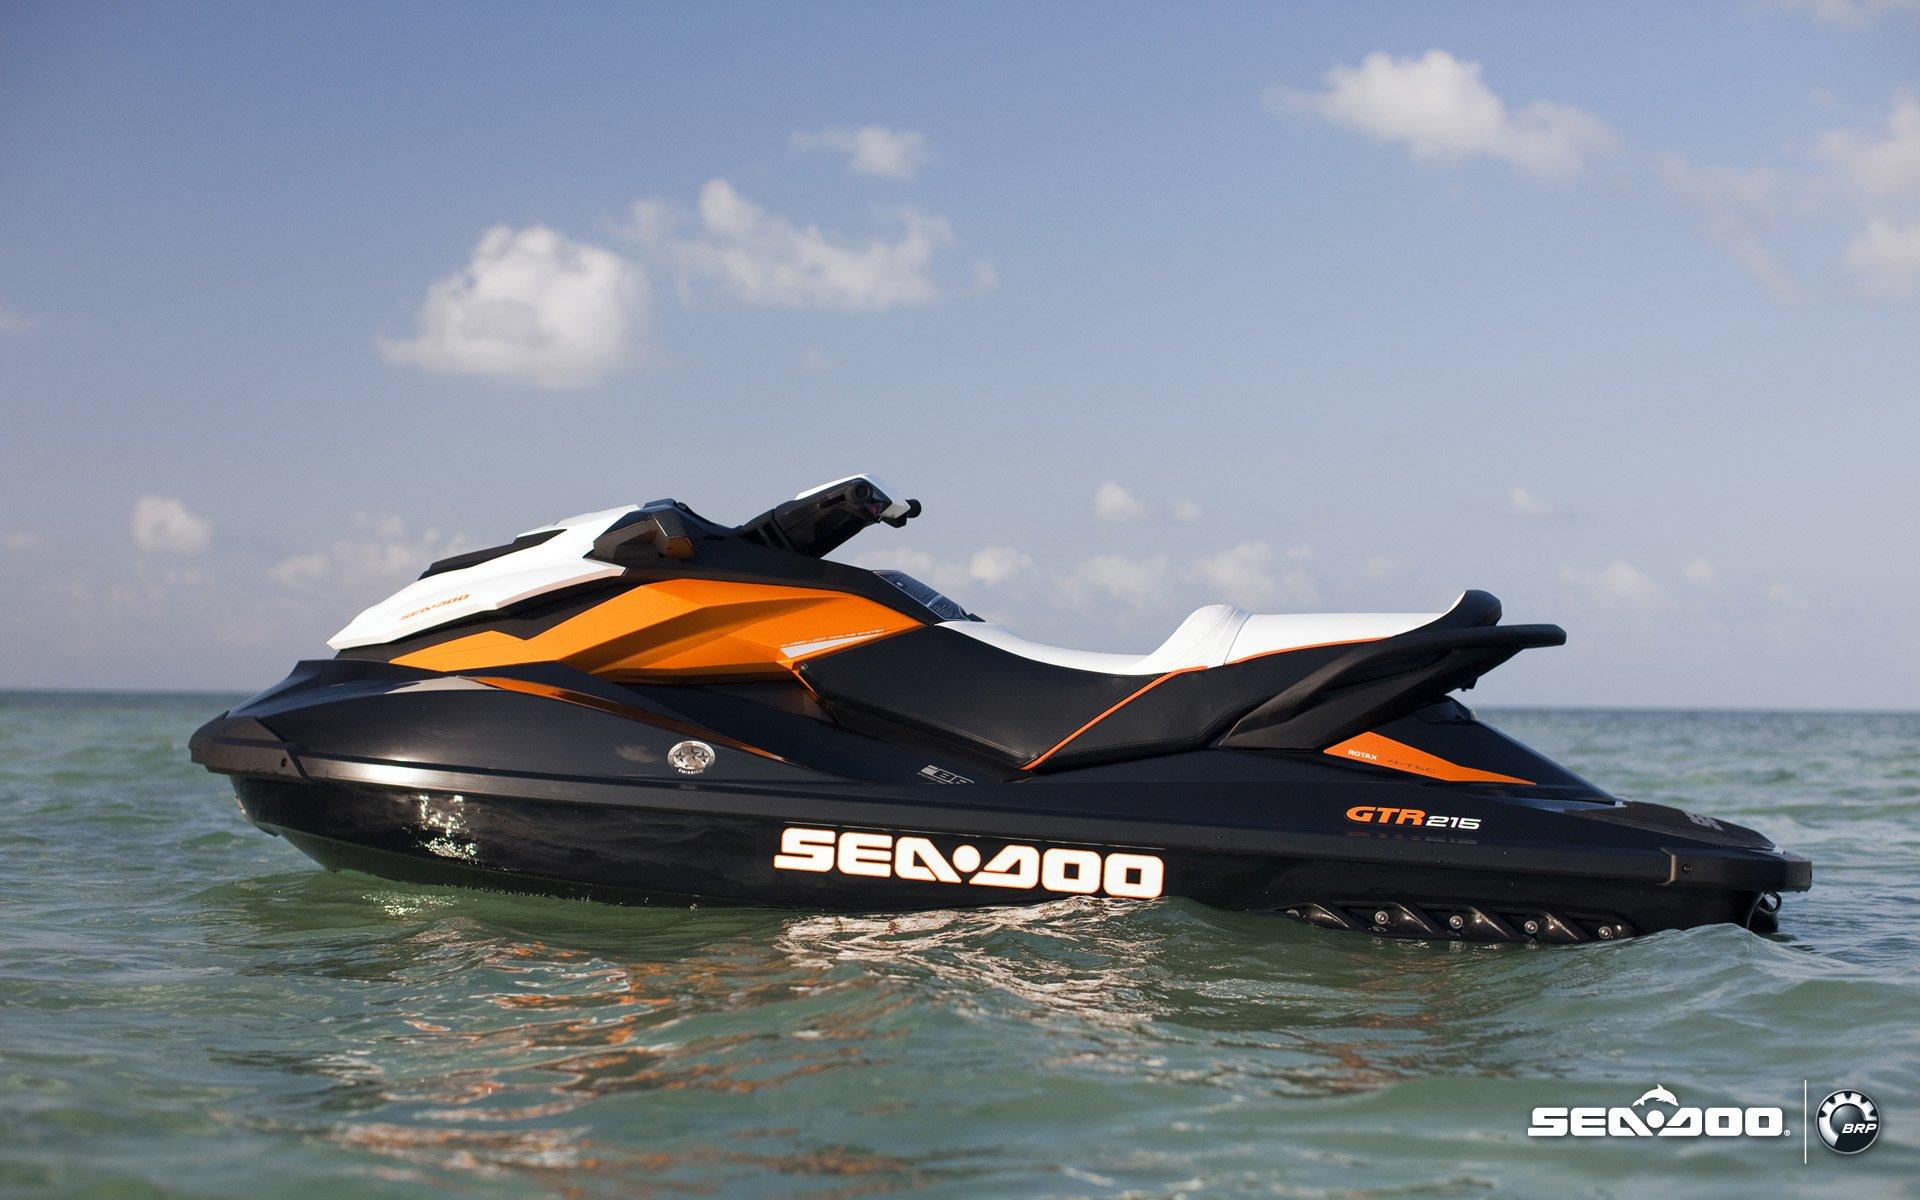 Sea Doo Gti 130 >> sea doo Full HD Wallpaper and Background Image   1920x1200   ID:457779